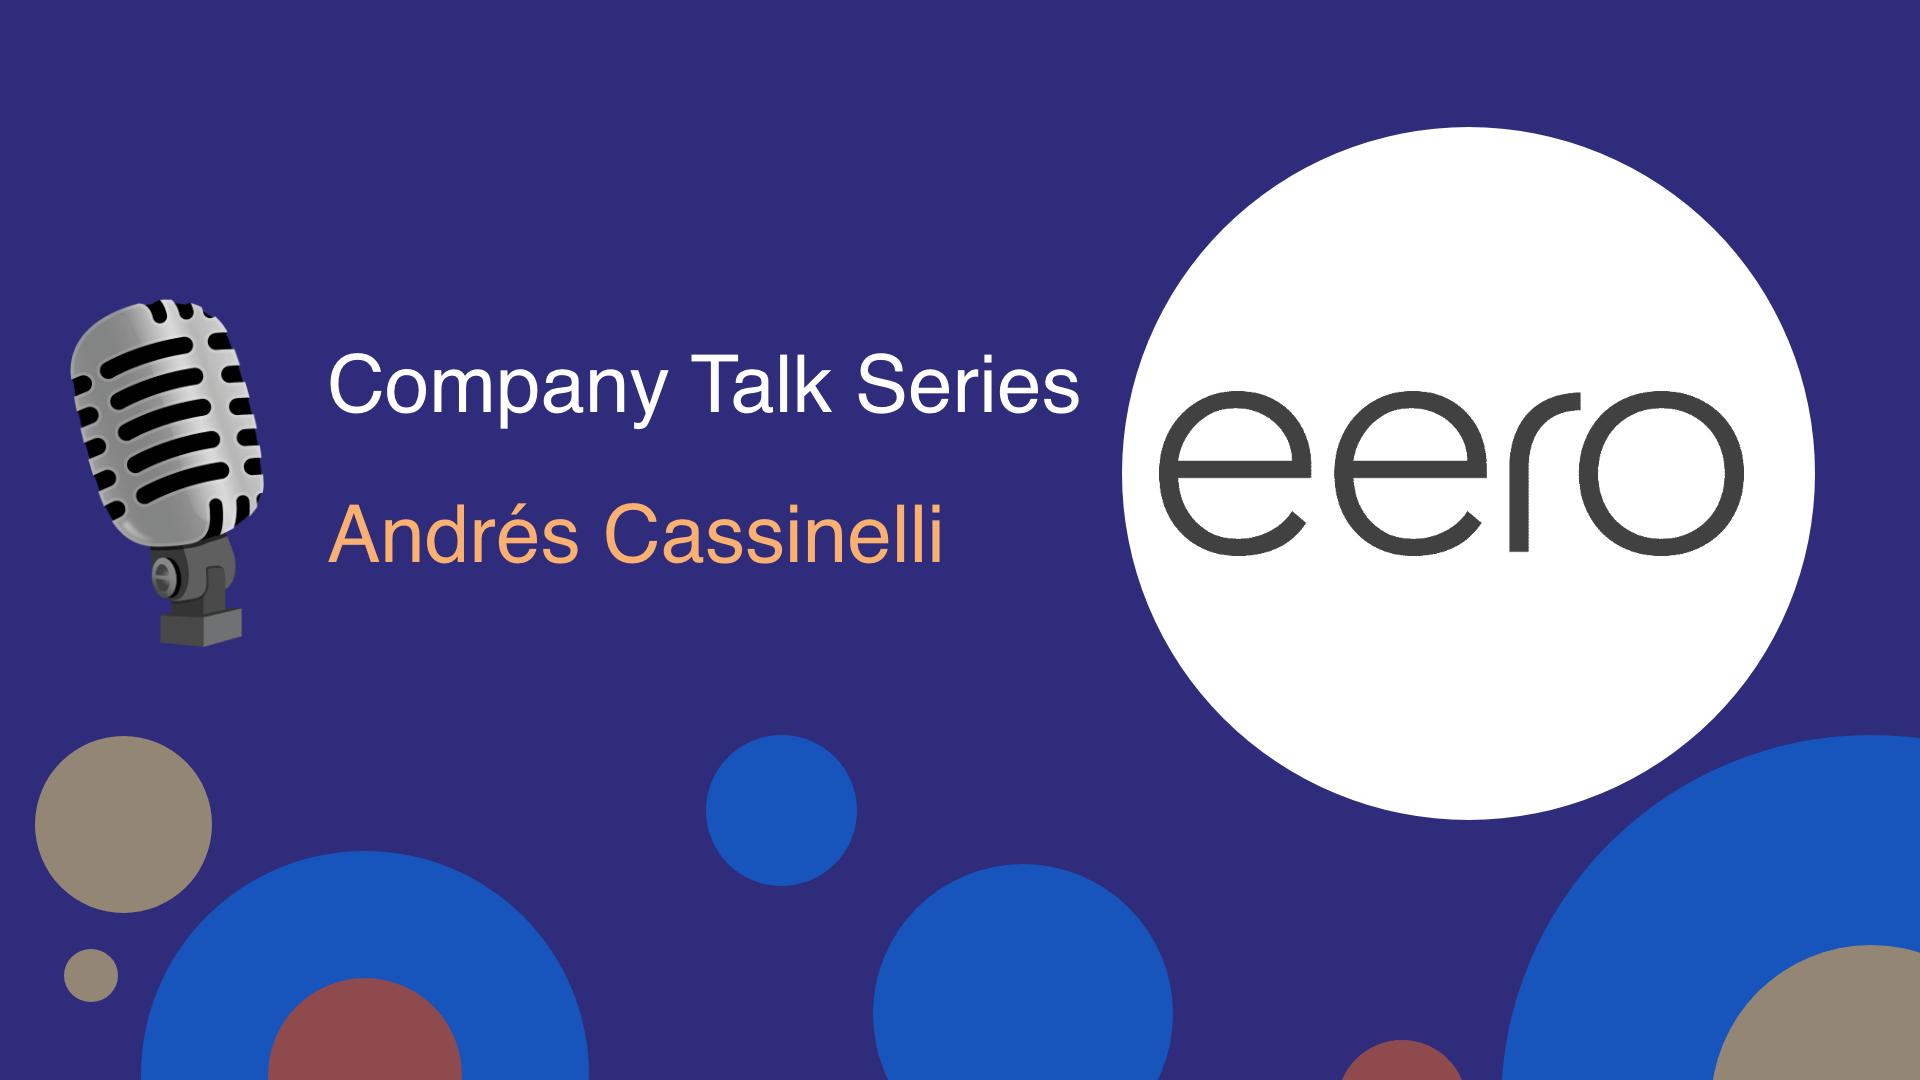 Company Talk Series: eero